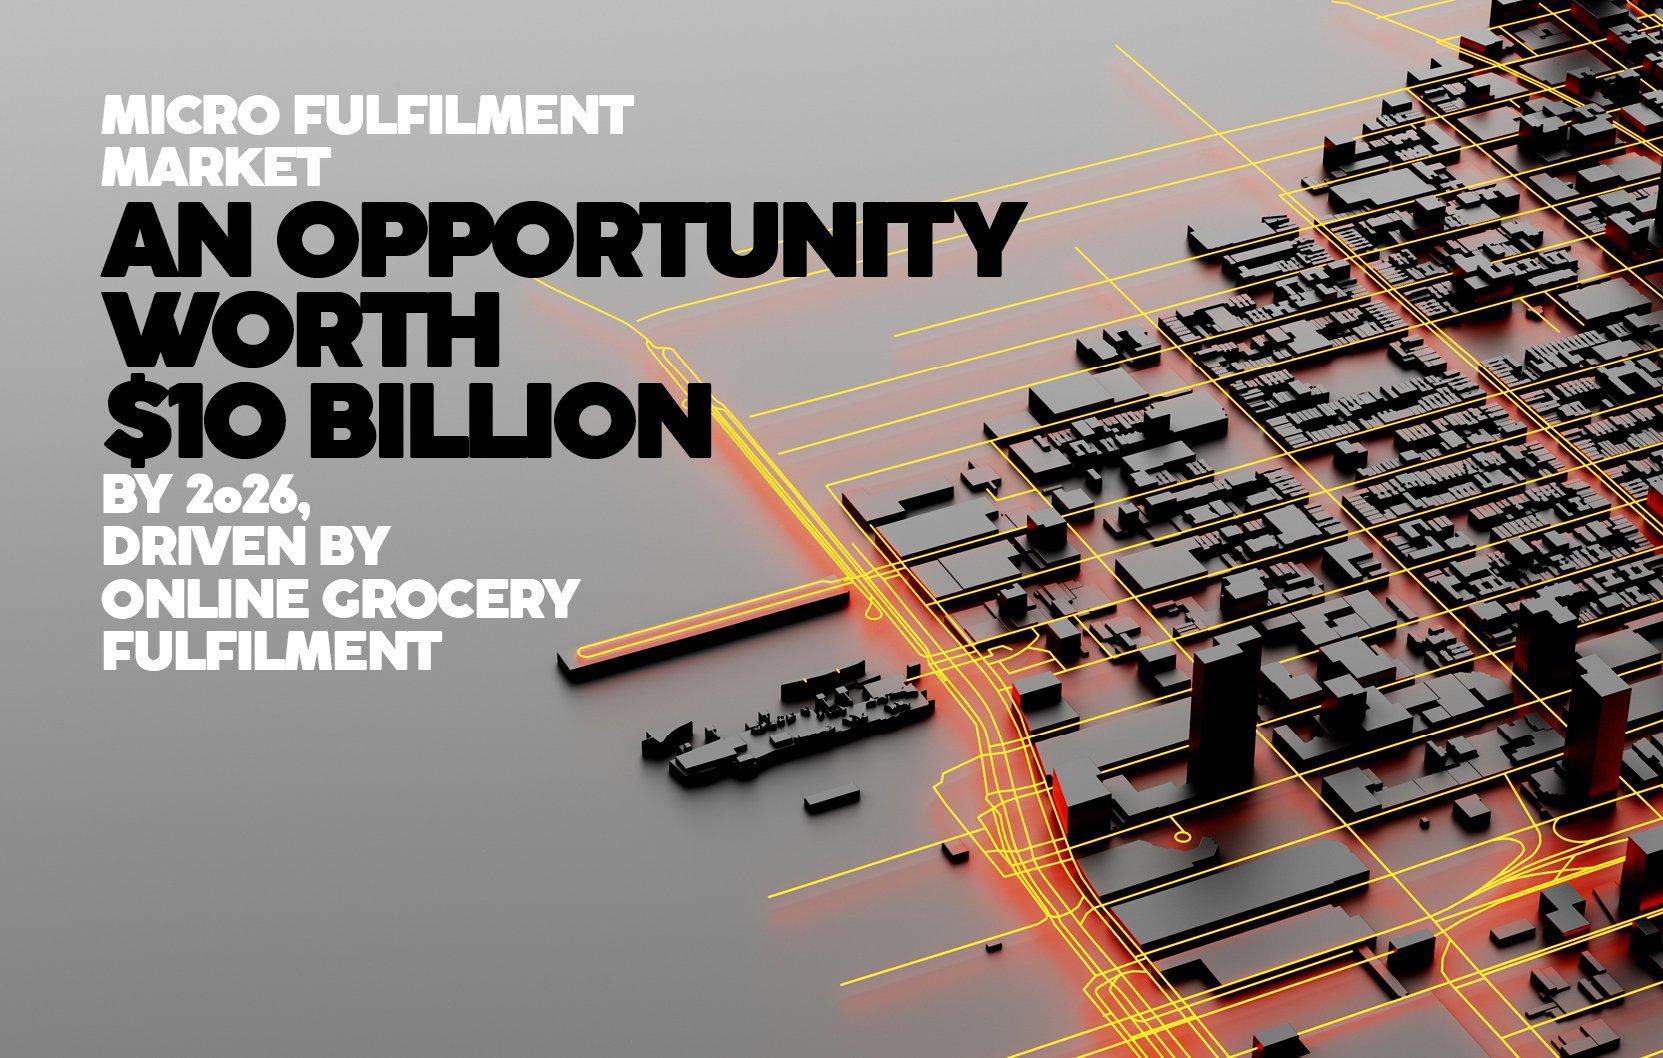 MICRO FULFILMENT MARKET WORTH $10 BILLION BY 2026